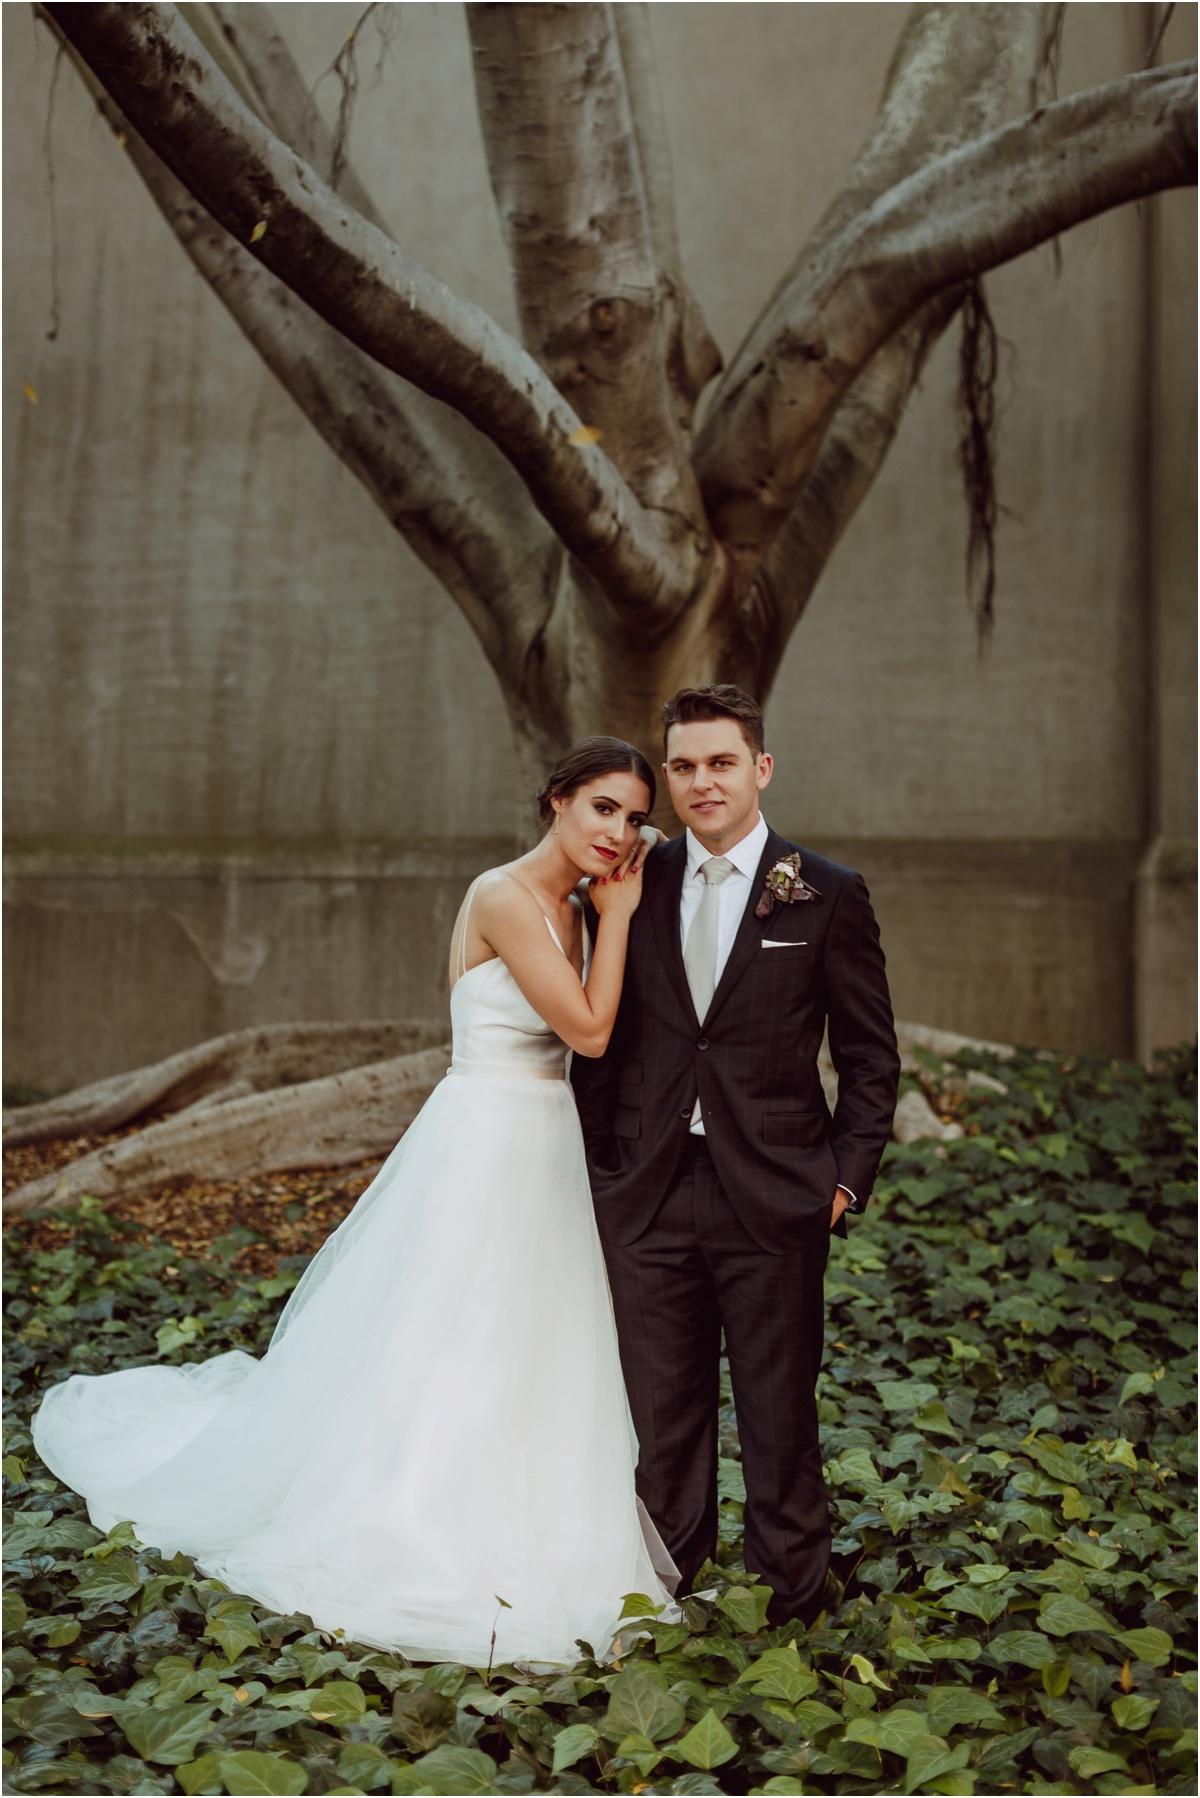 Sydney-Wedding-Photographer-034.JPG